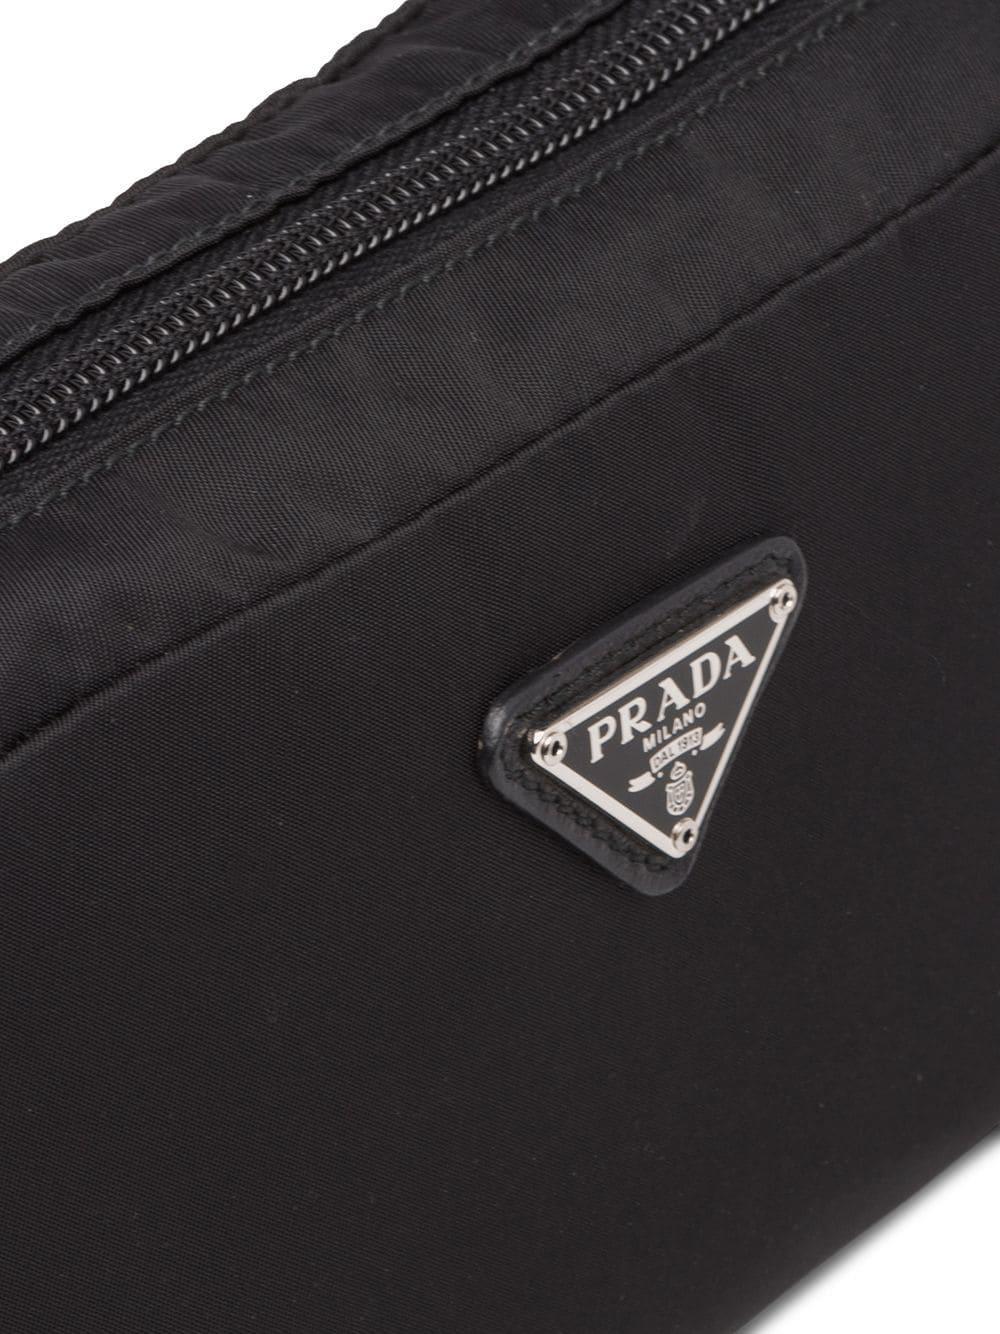 4a461ab983 Lyst - Prada Fabric Cosmetic Pouch in Black - Save 12.903225806451616%